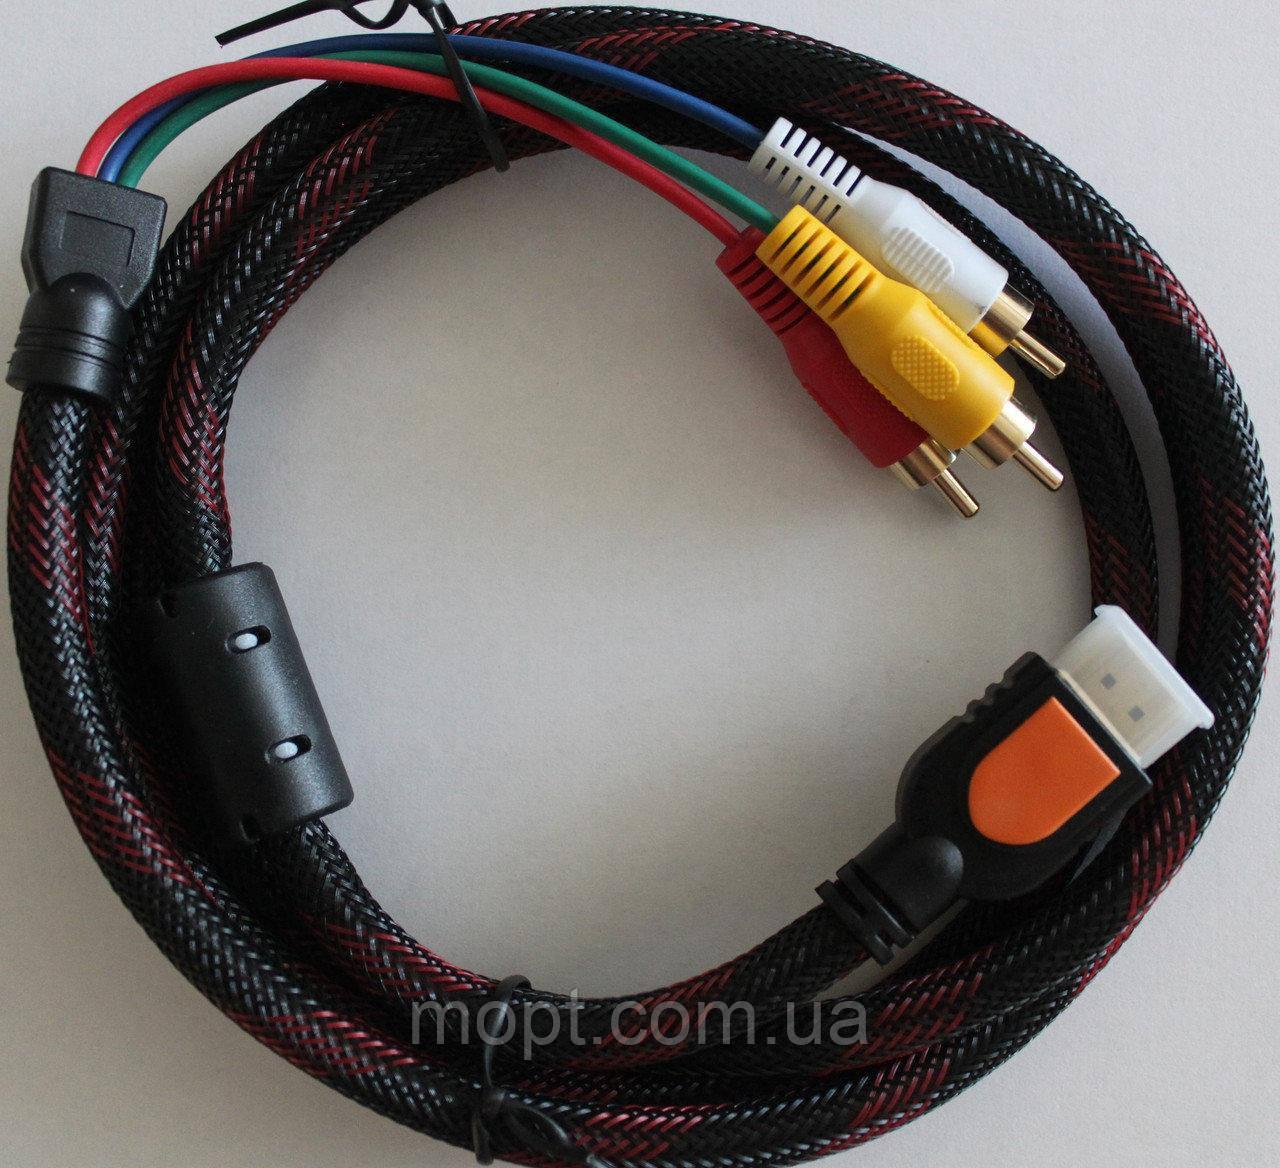 Кабель HDMI / 3 RCA 1.5м ТВ Аудио Видео Шнуры